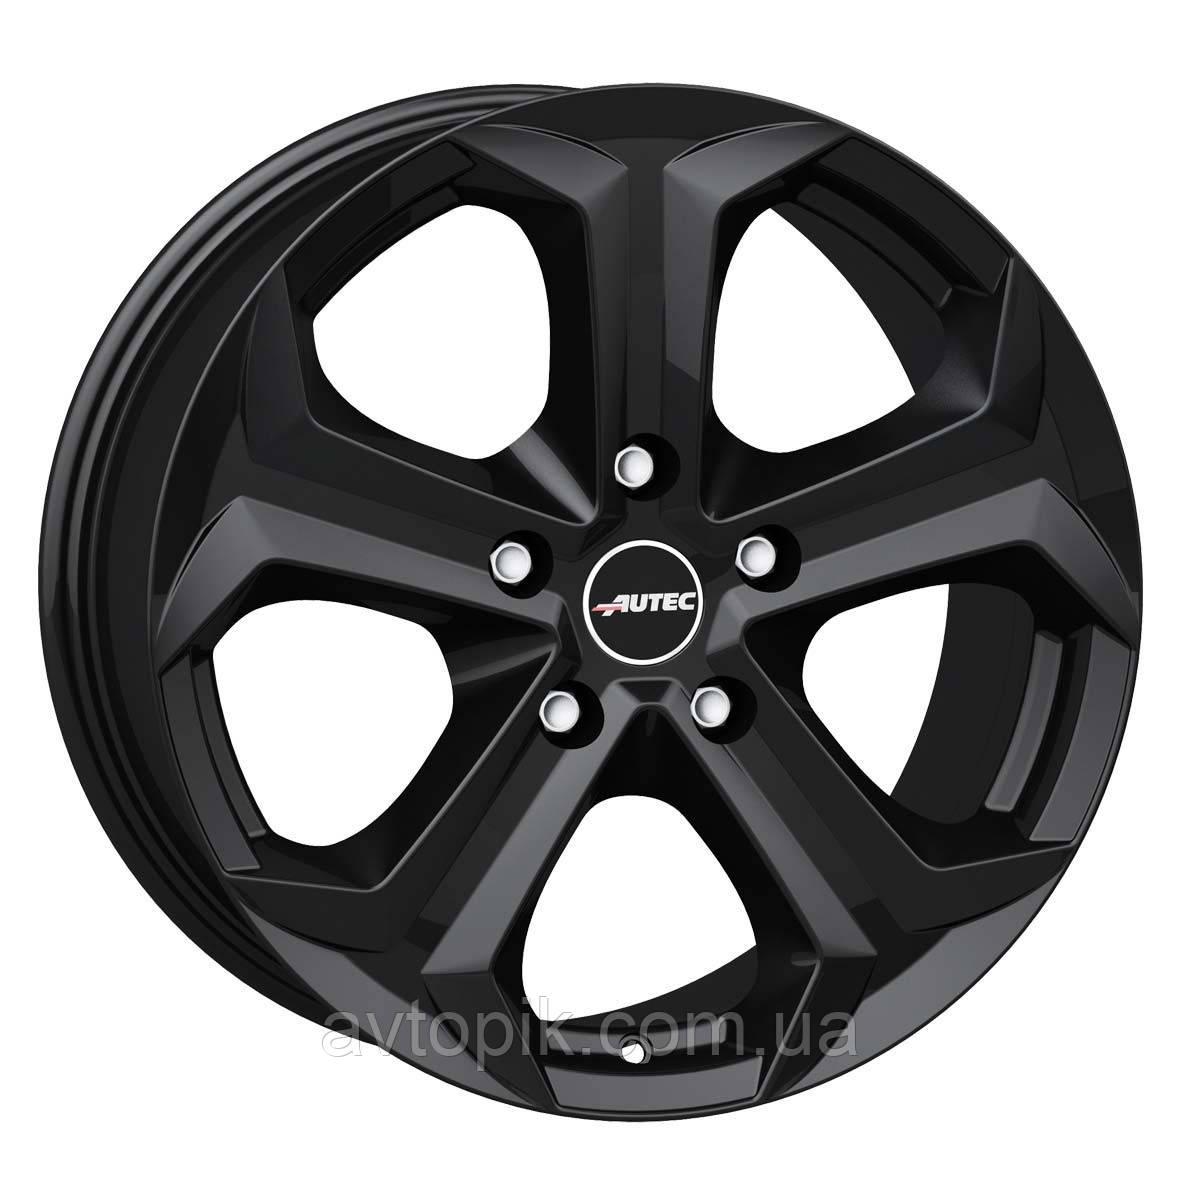 Литые диски Autec Xenos R17 W7 PCD5x120 ET50 DIA65.1 (matt black)